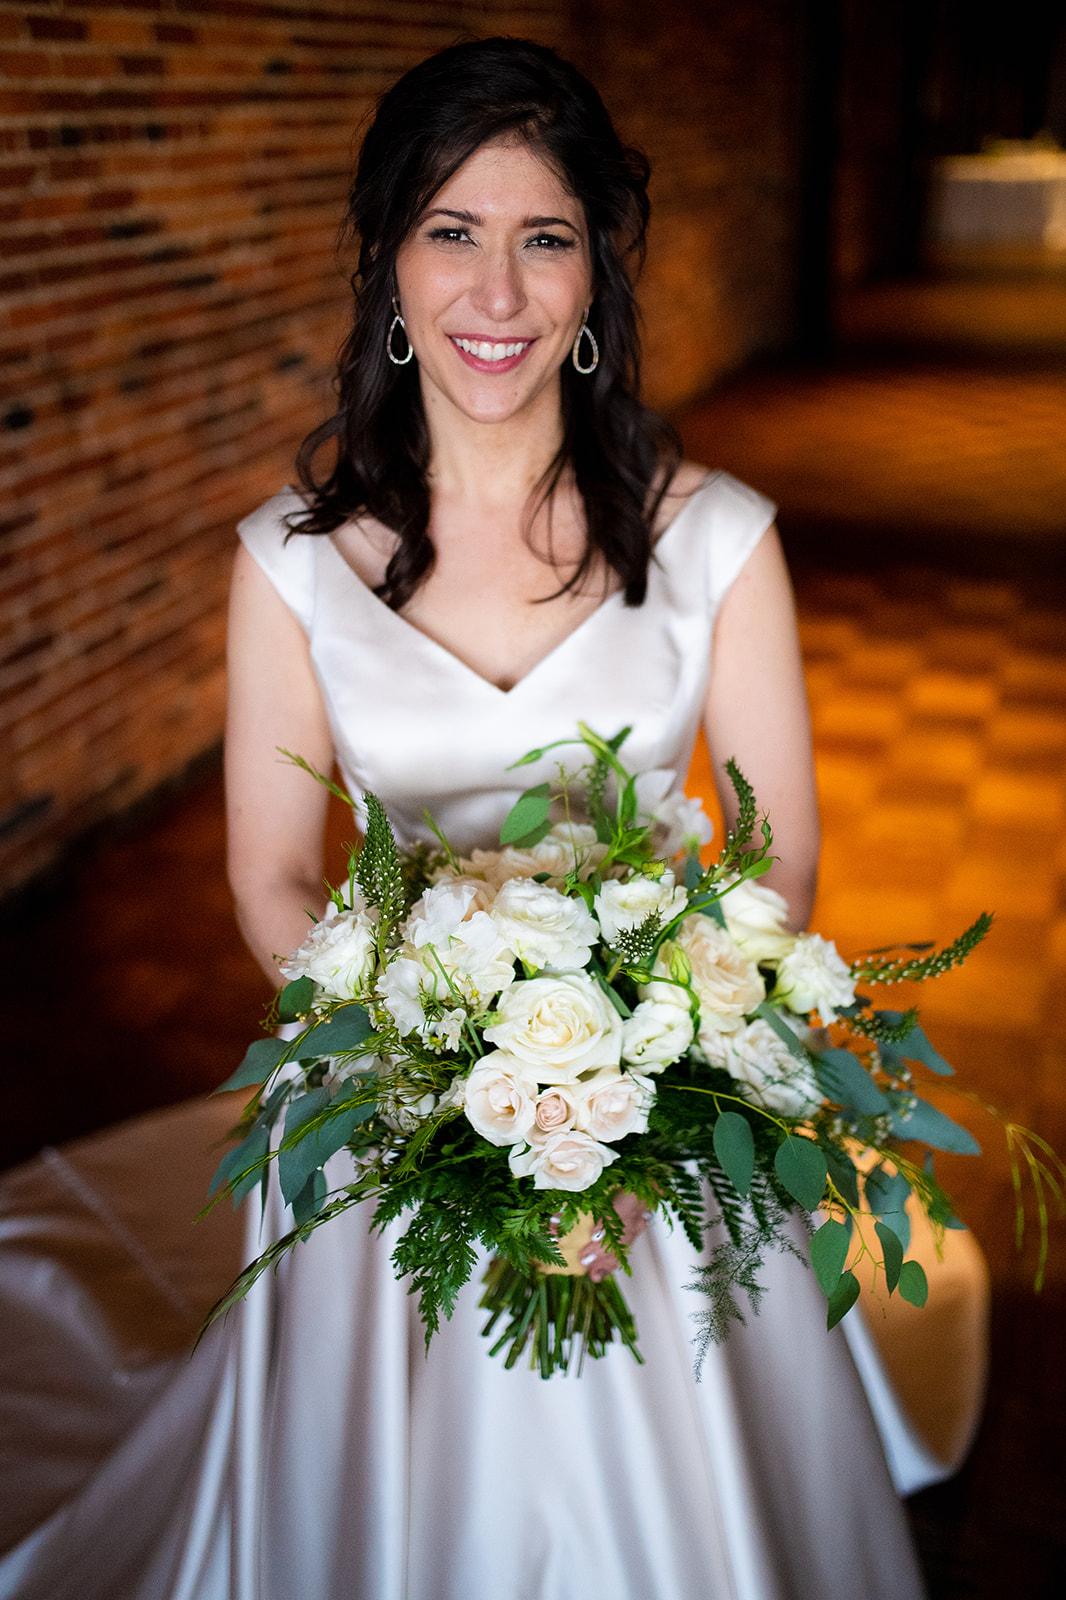 The_best_of_the_best_wedding_photographer_Mantas_Kubilinskas-304.jpg